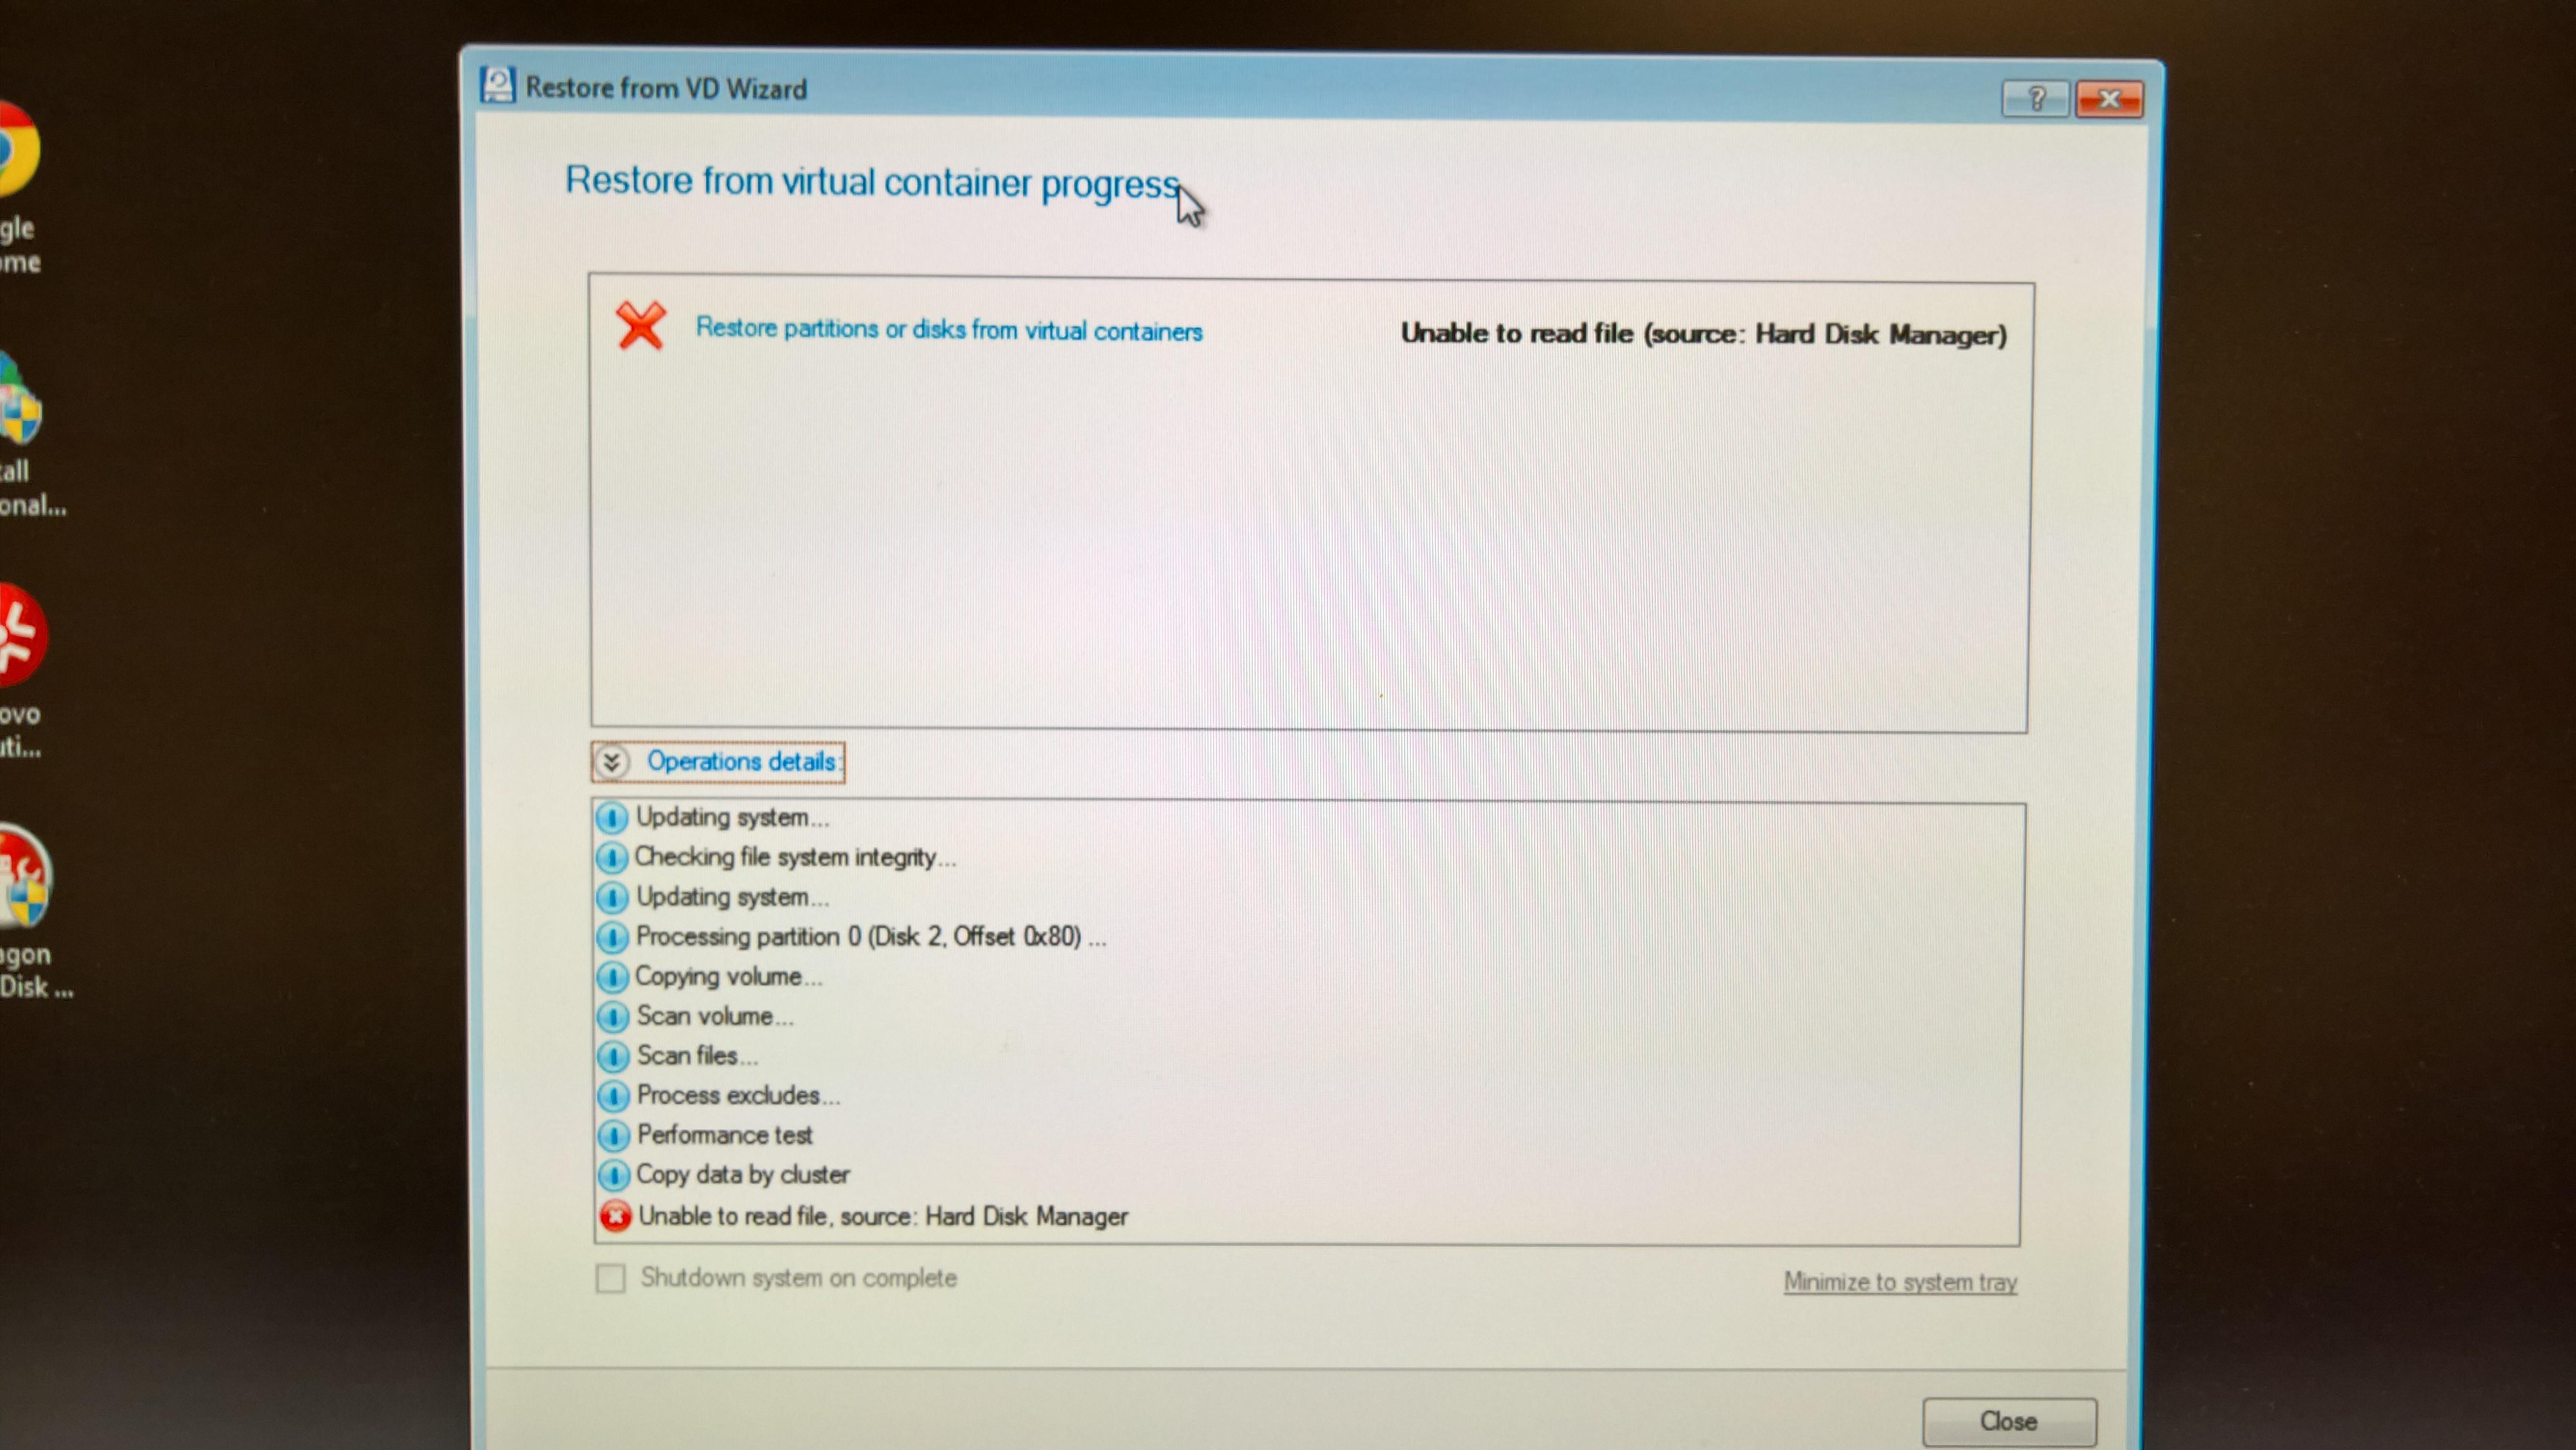 Windows Image Restore